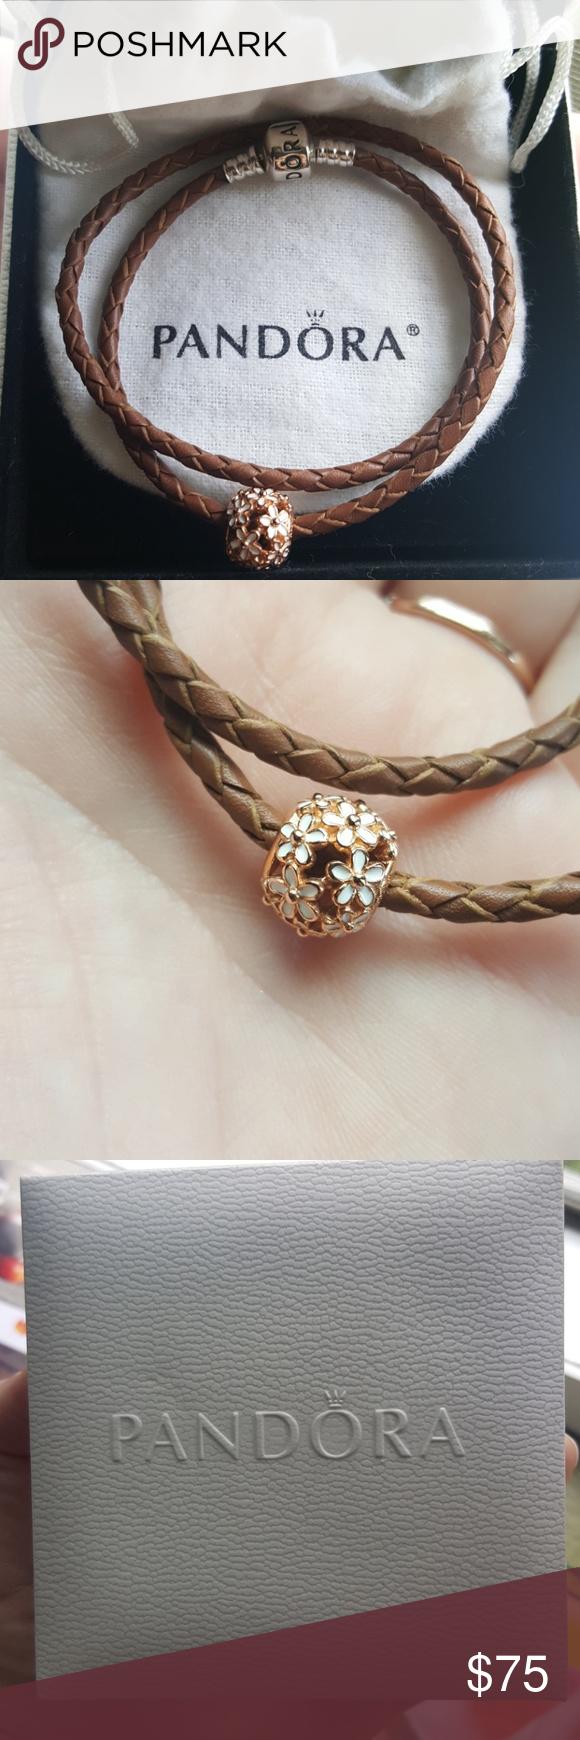 Leather pandora bracelet with rose daisy charm jewelry bracelets